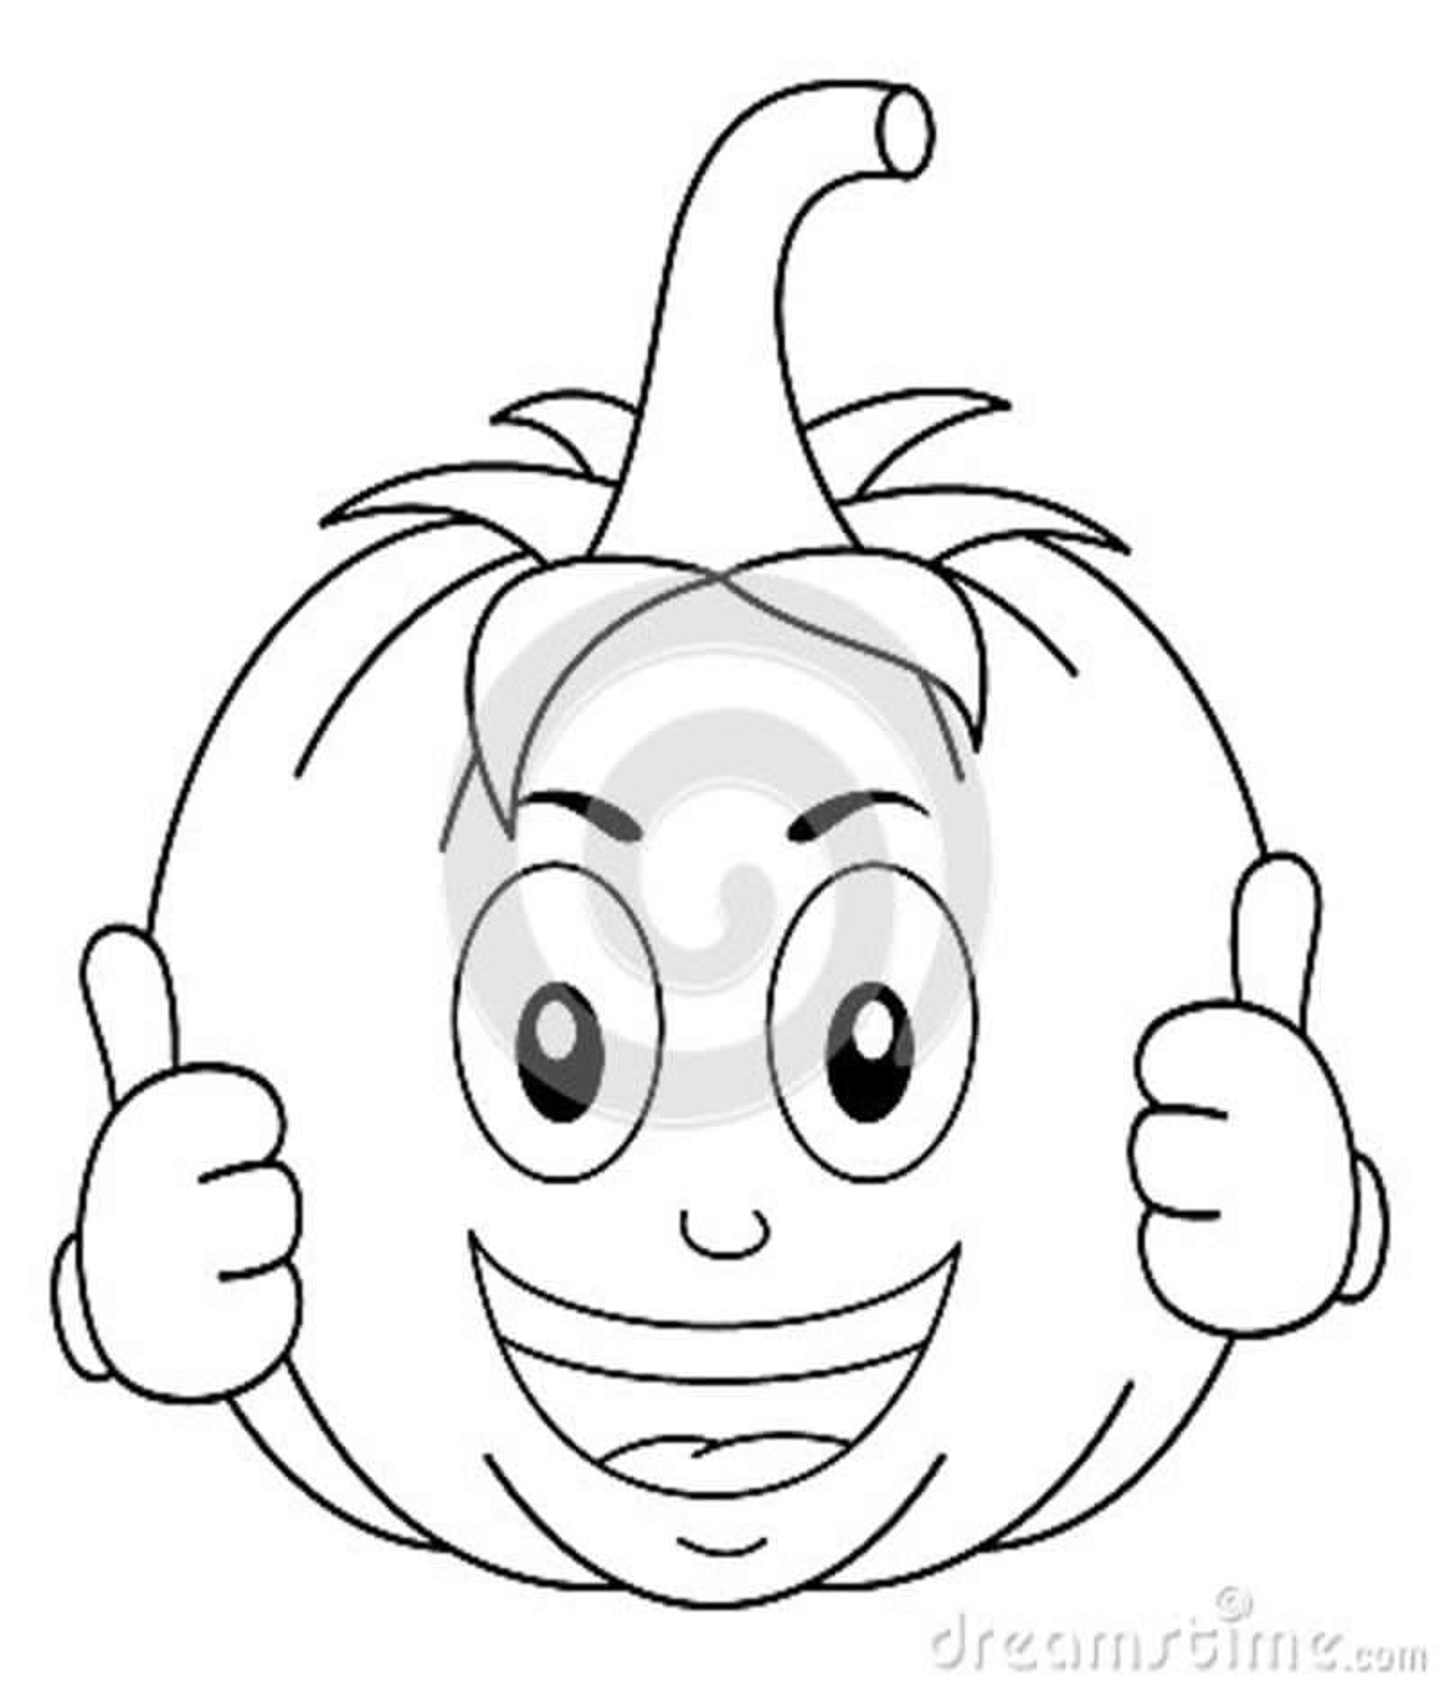 Coloring Funny Pumpkin Cartoon Character Stock Vector Illustration